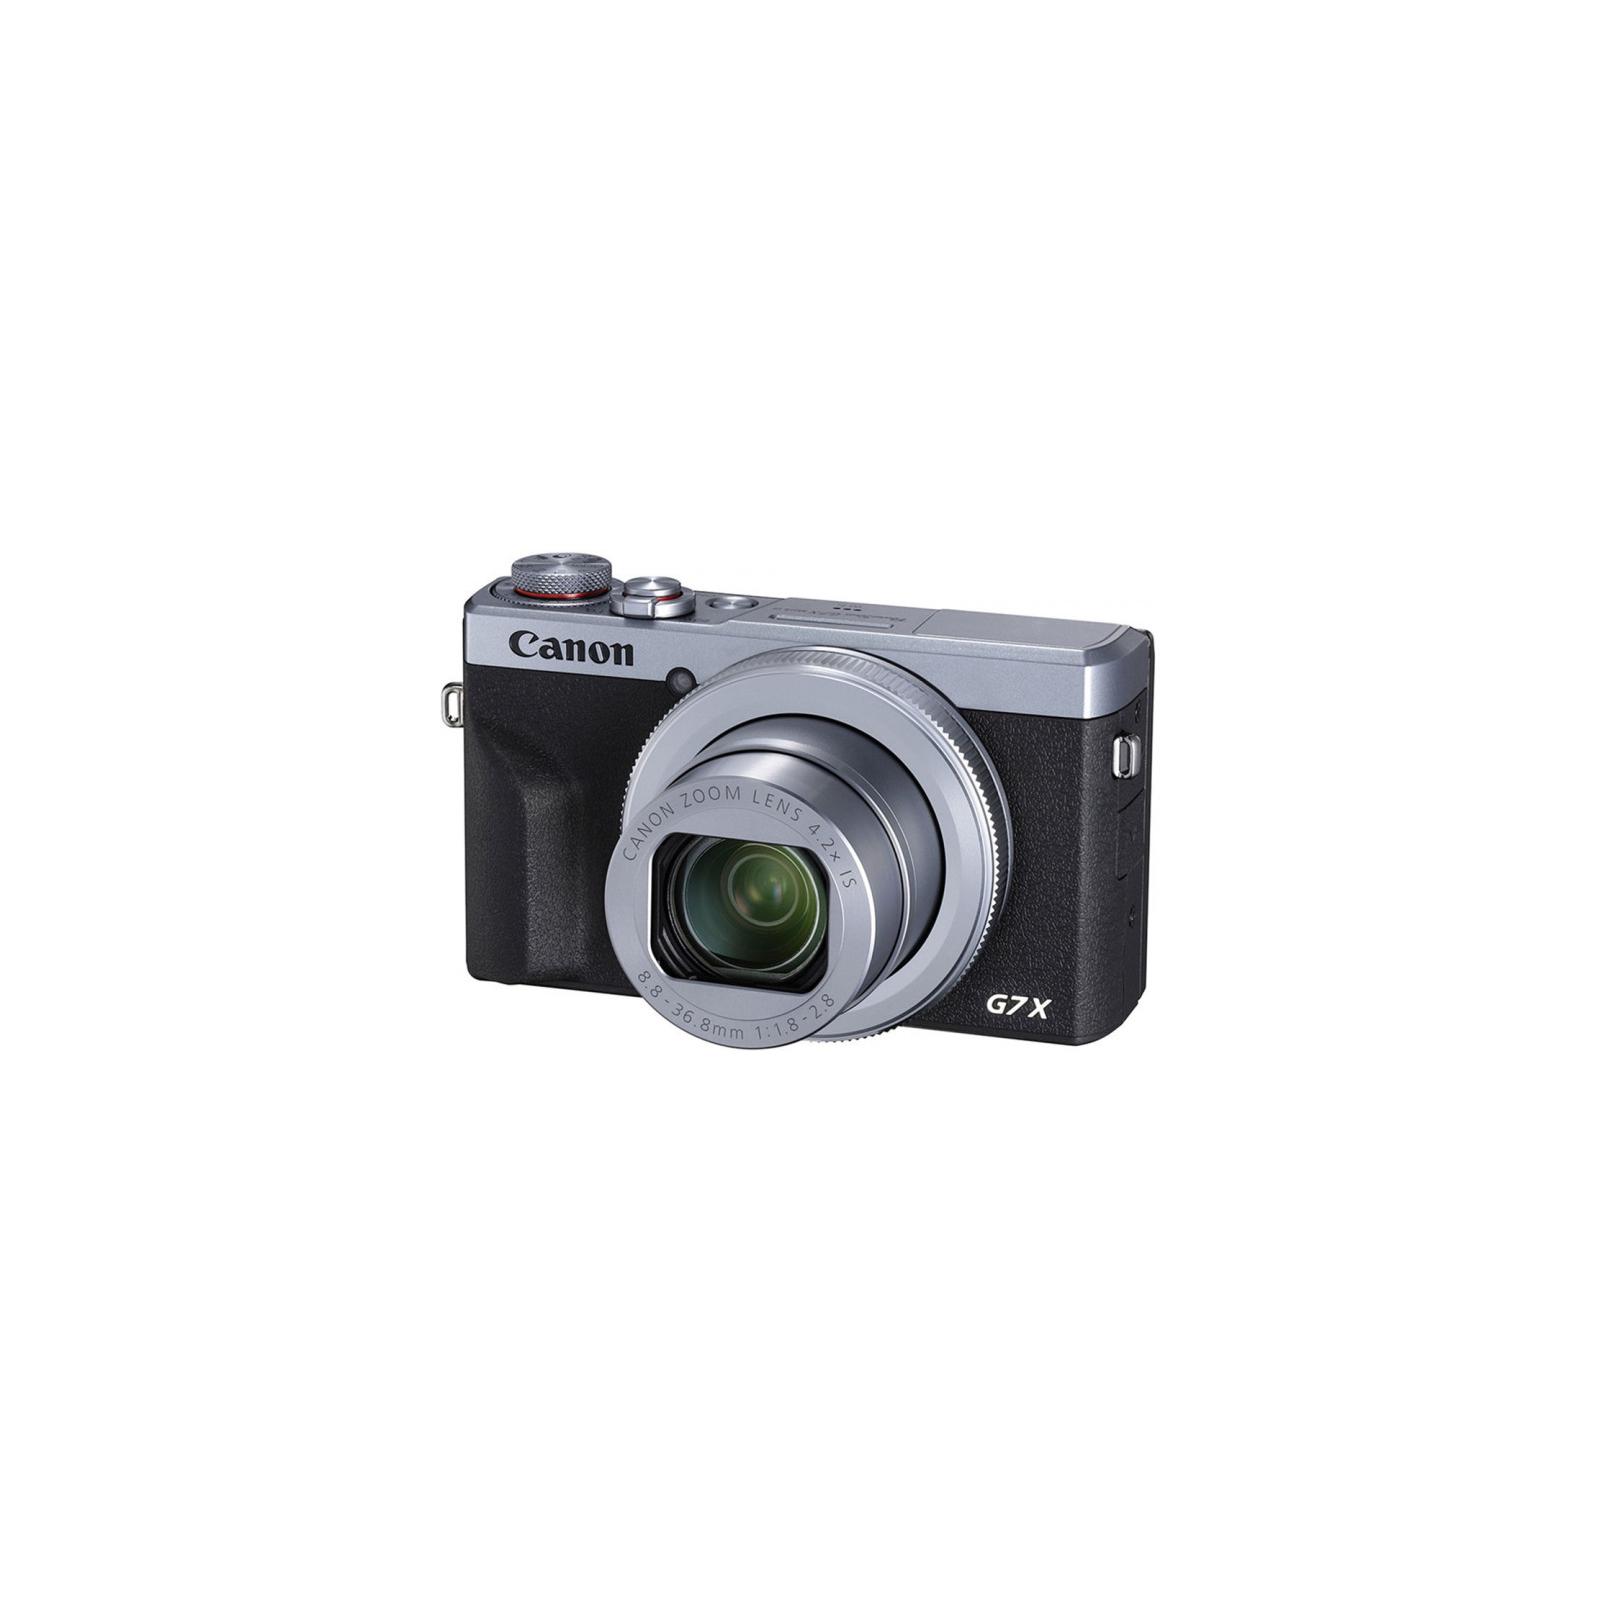 Цифровой фотоаппарат Canon Powershot G7 X Mark III Black (3637C013)